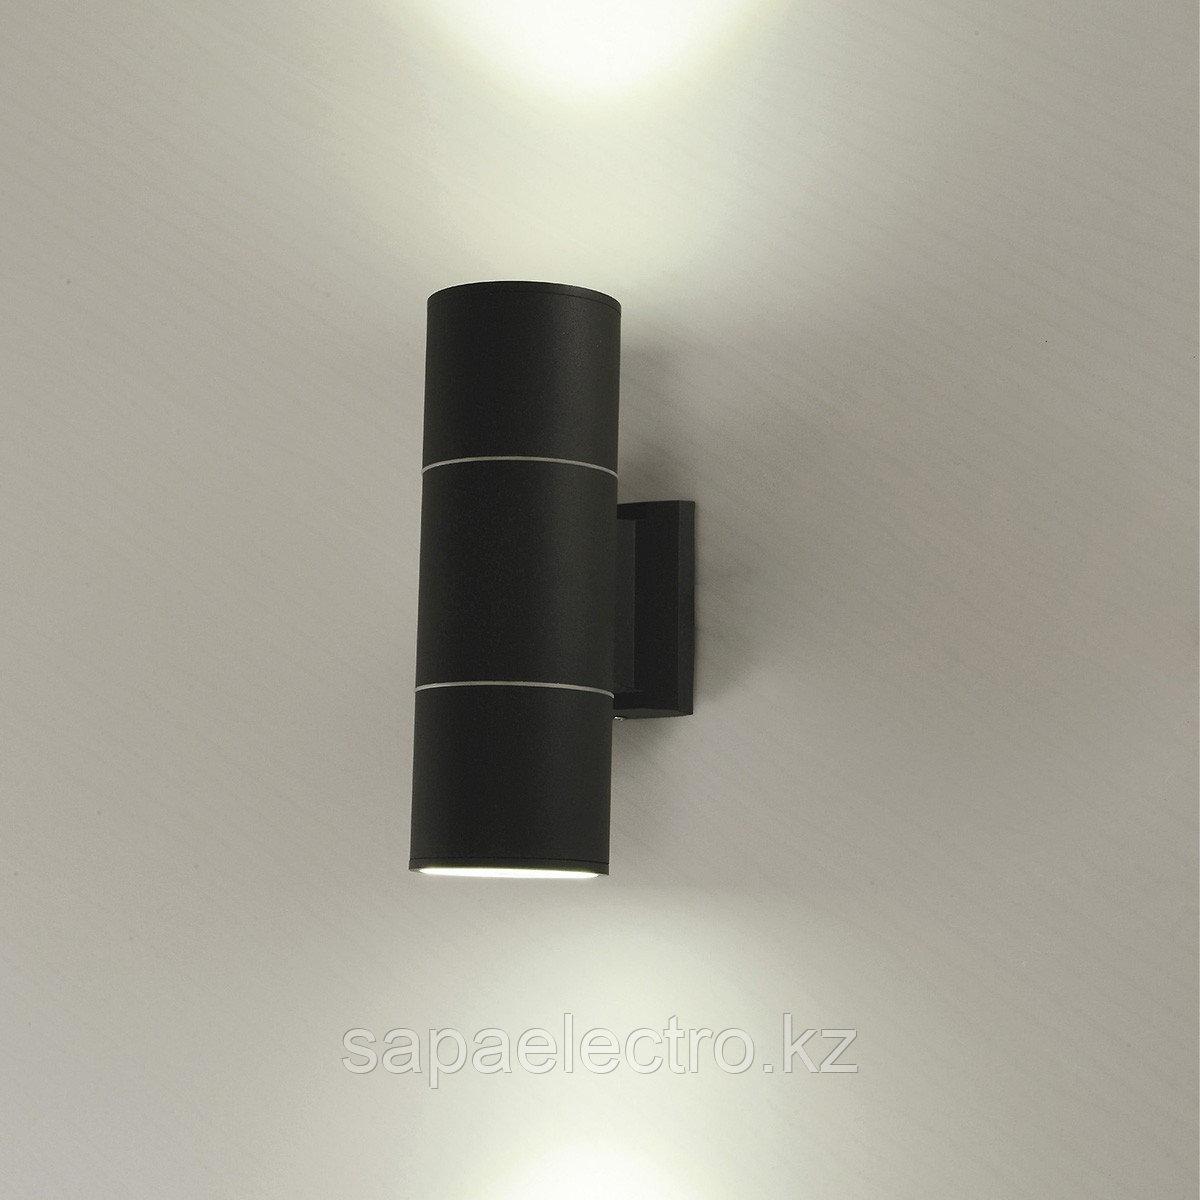 Свет-к LED B2152 2*10W Grey 5000K  (TS) 10шт